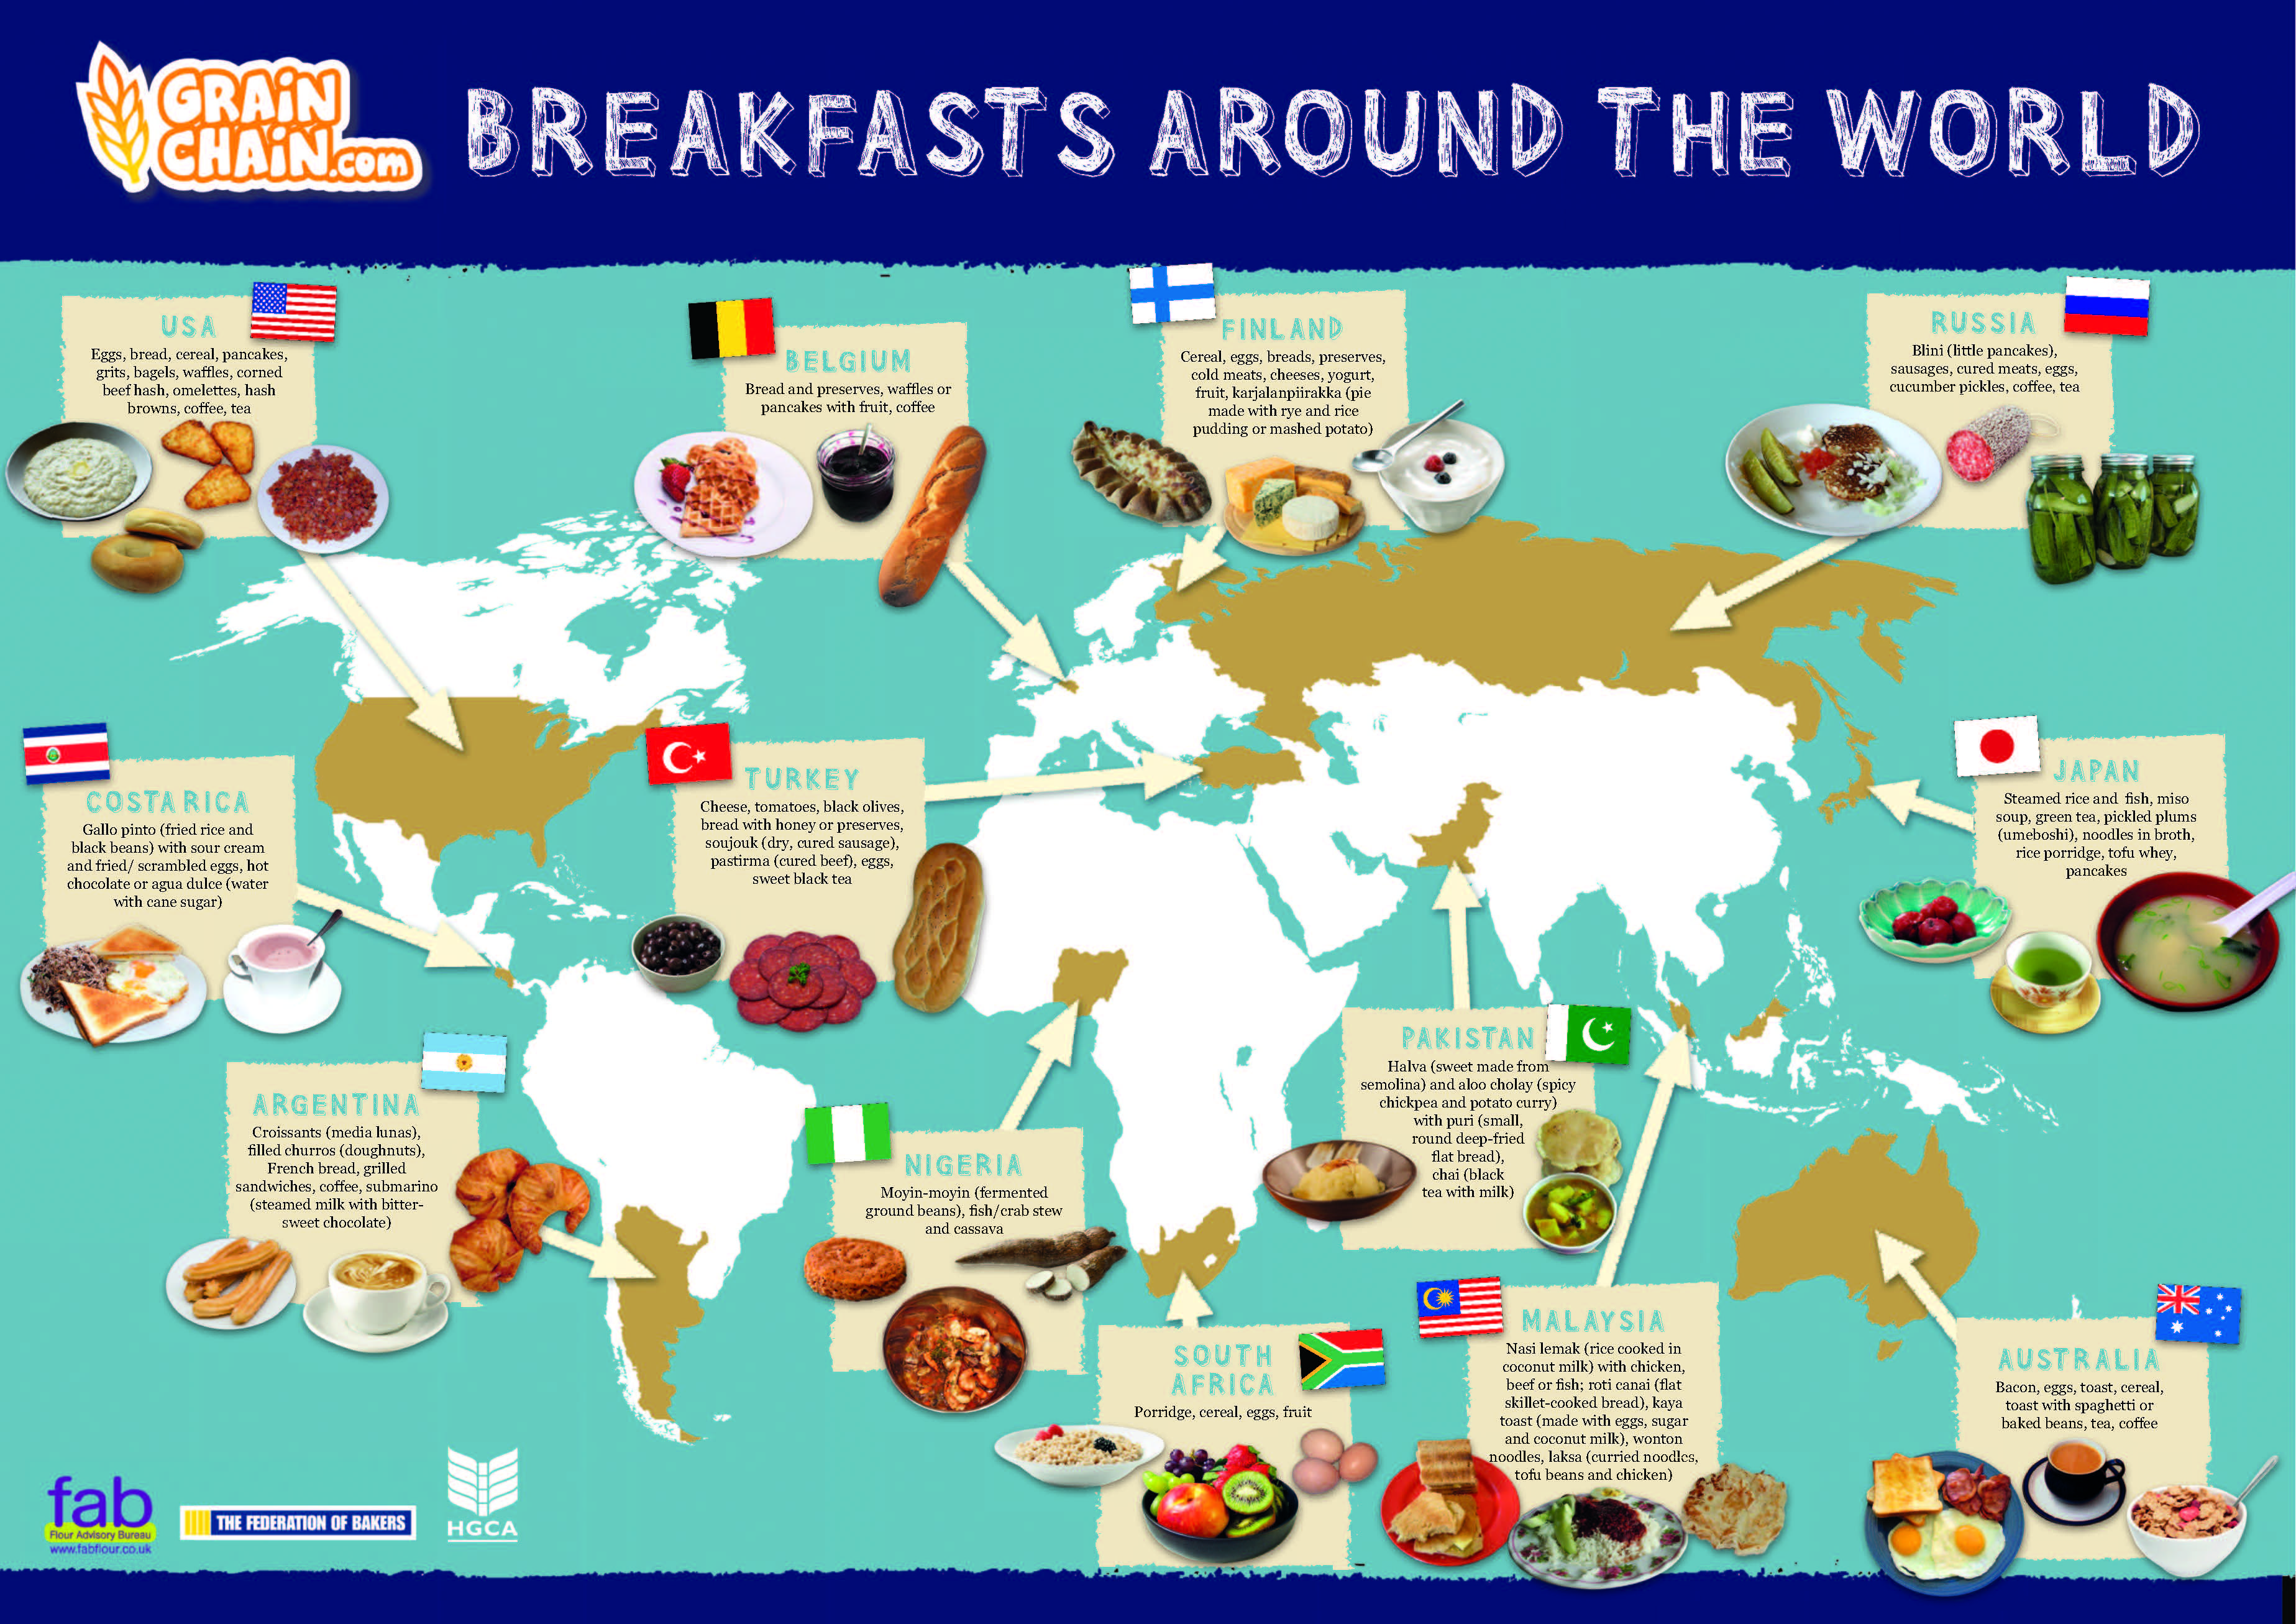 Wednesday - Breakfast around world